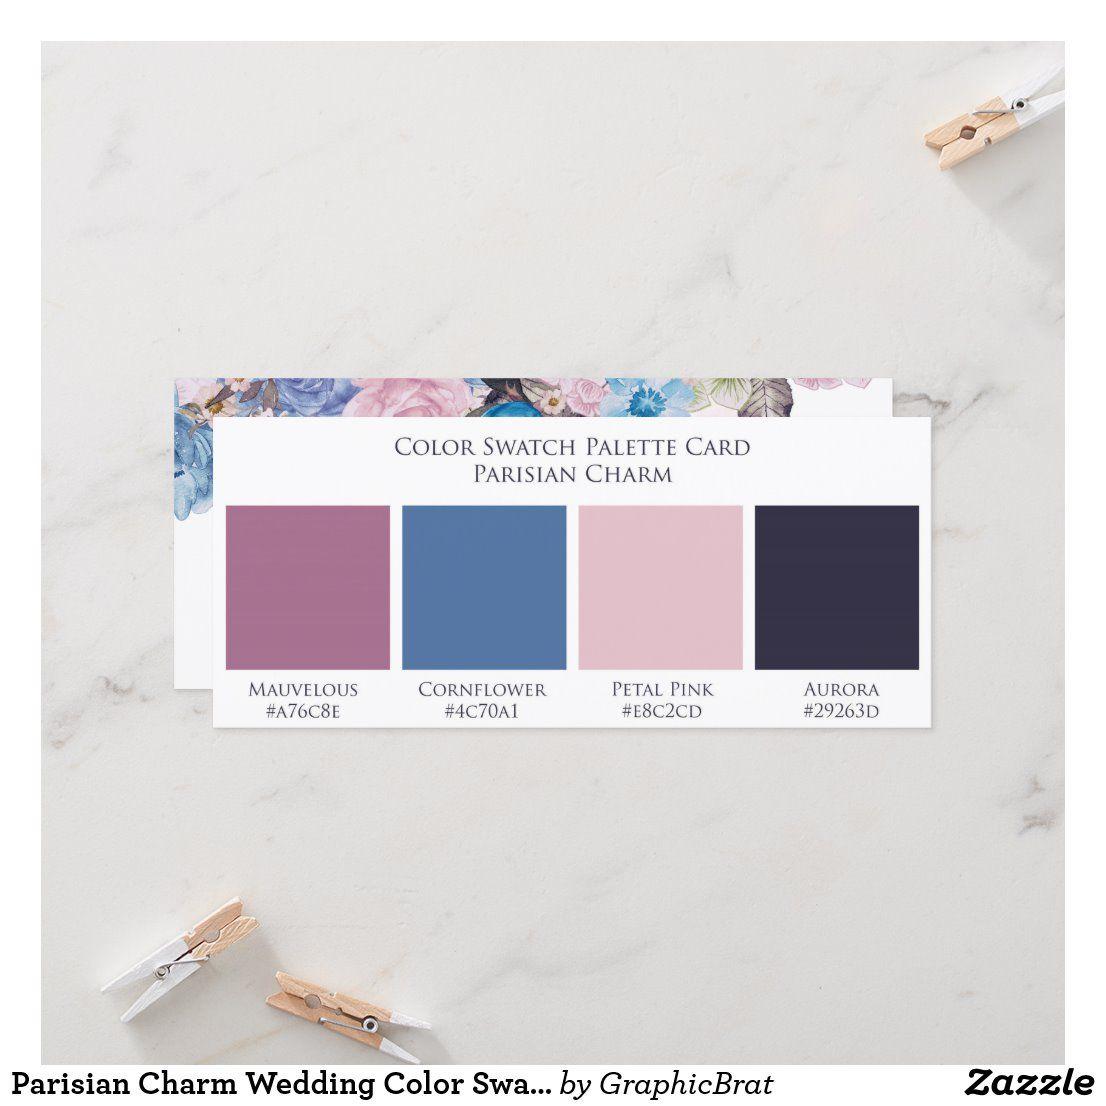 Parisian Charm Wedding Color Swatch Palette Card Zazzle Com In